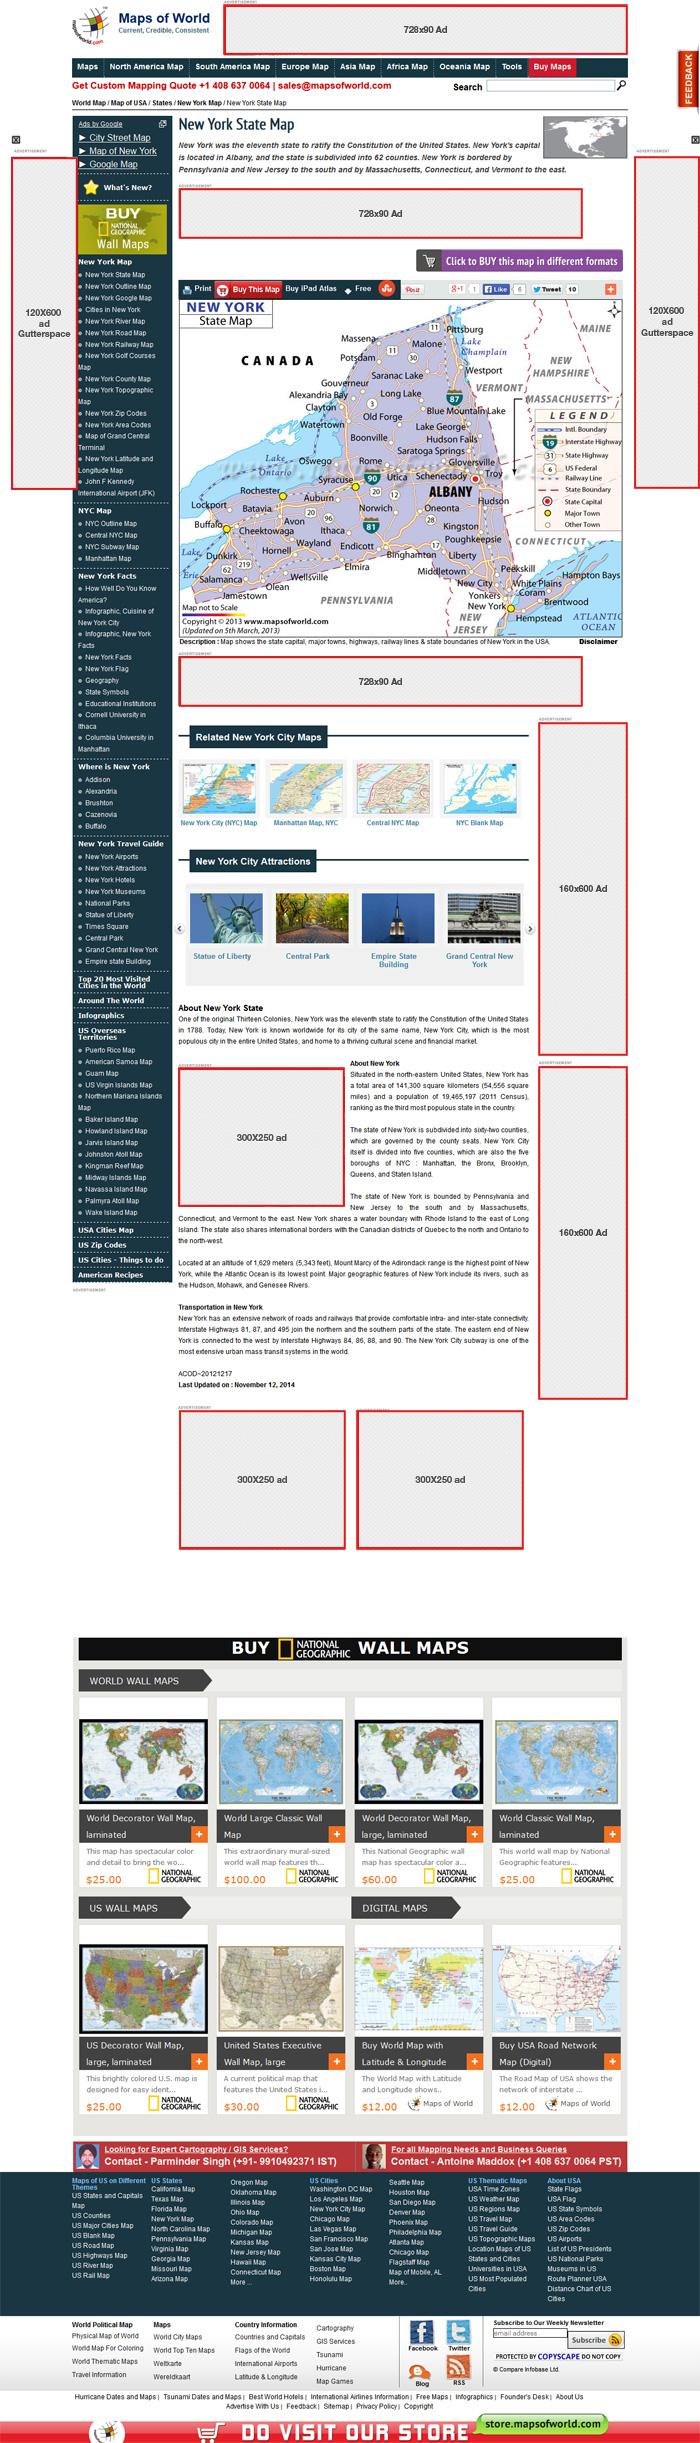 Advertise Online, Advertise on MapsofWorld